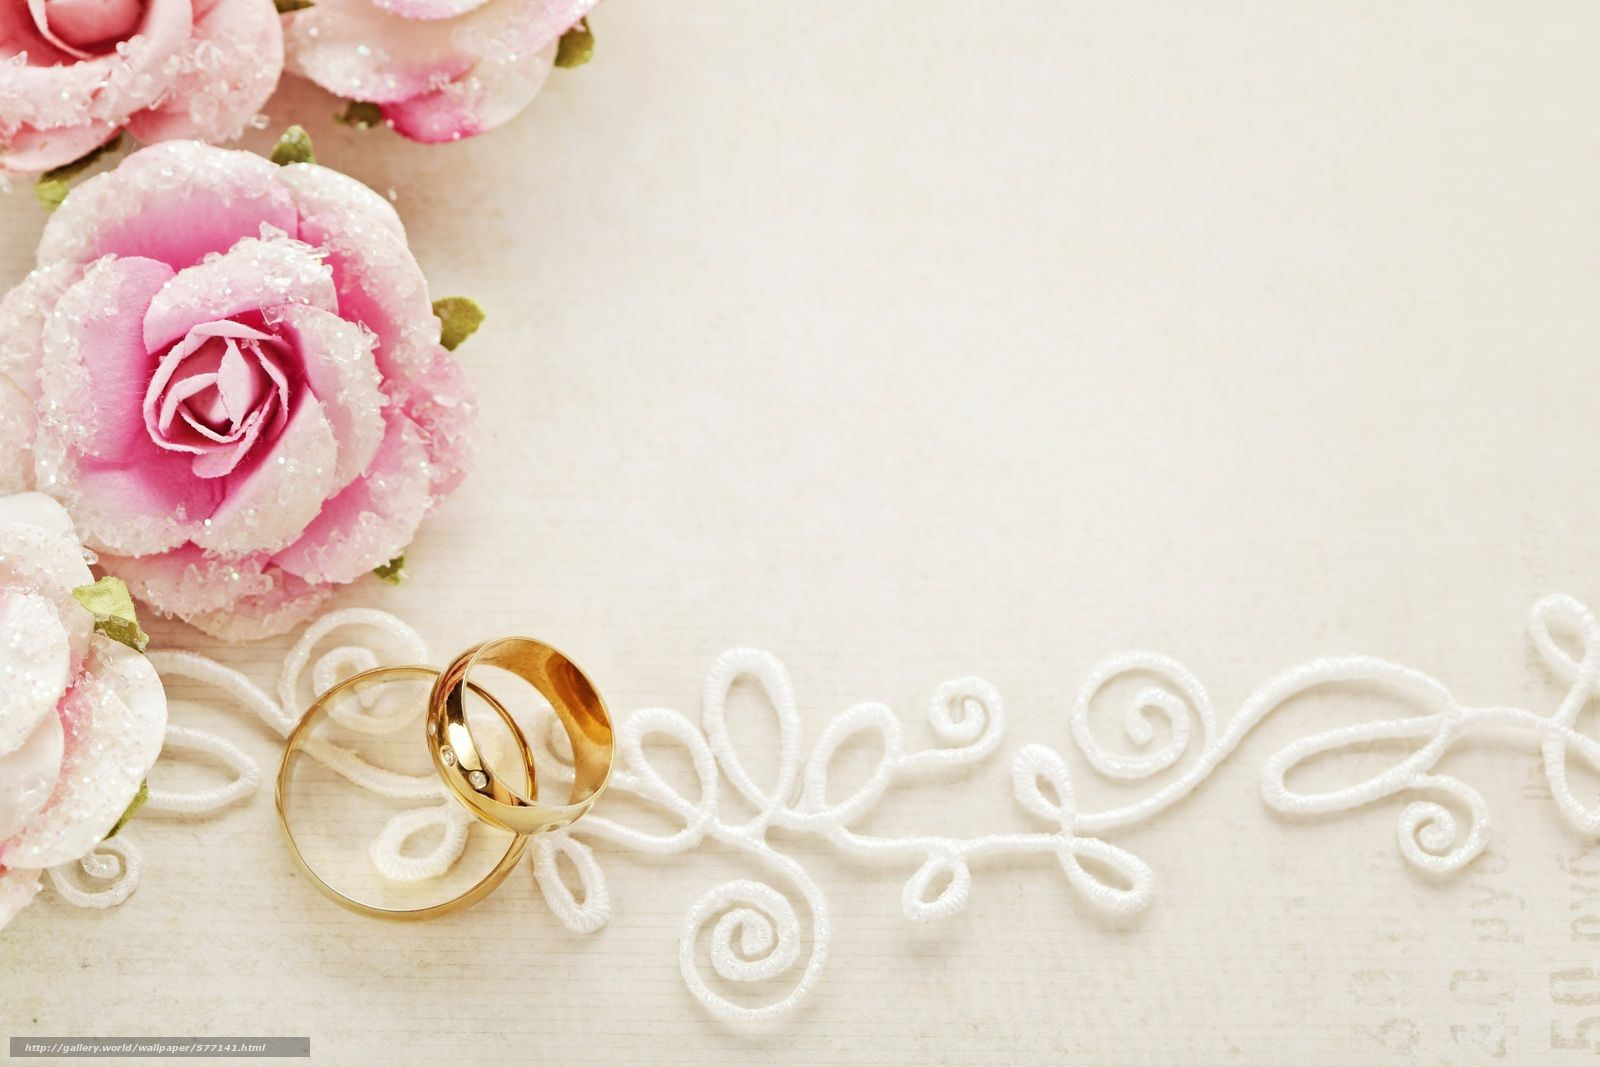 35 Best Free Wedding Wallpapers